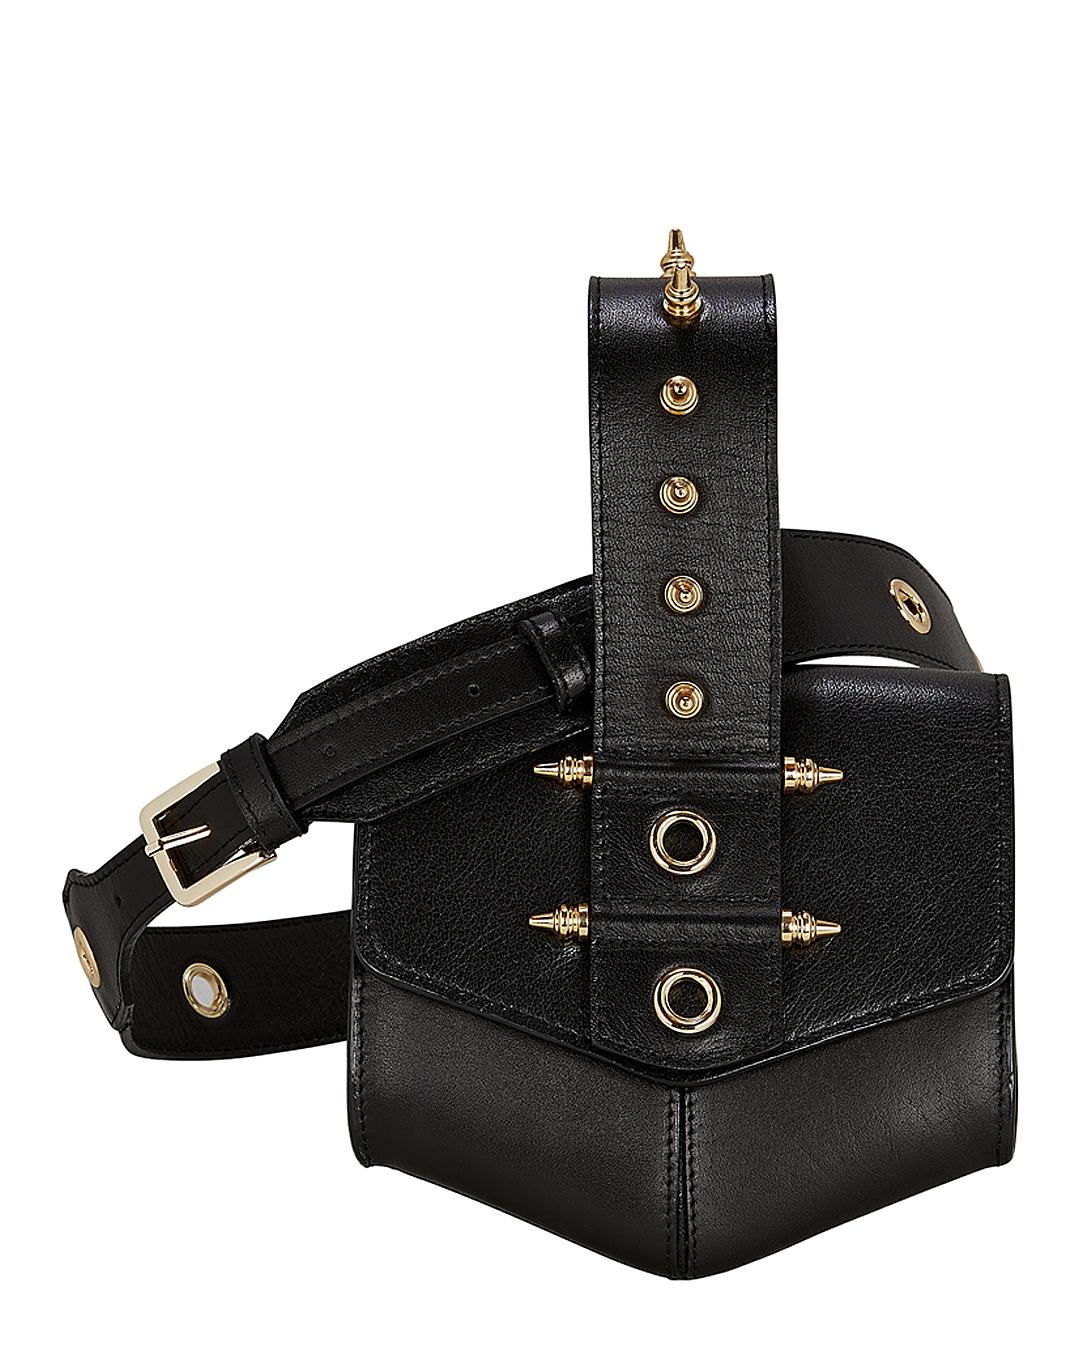 OKHTEIN Rodhawk Leather Belt Bag